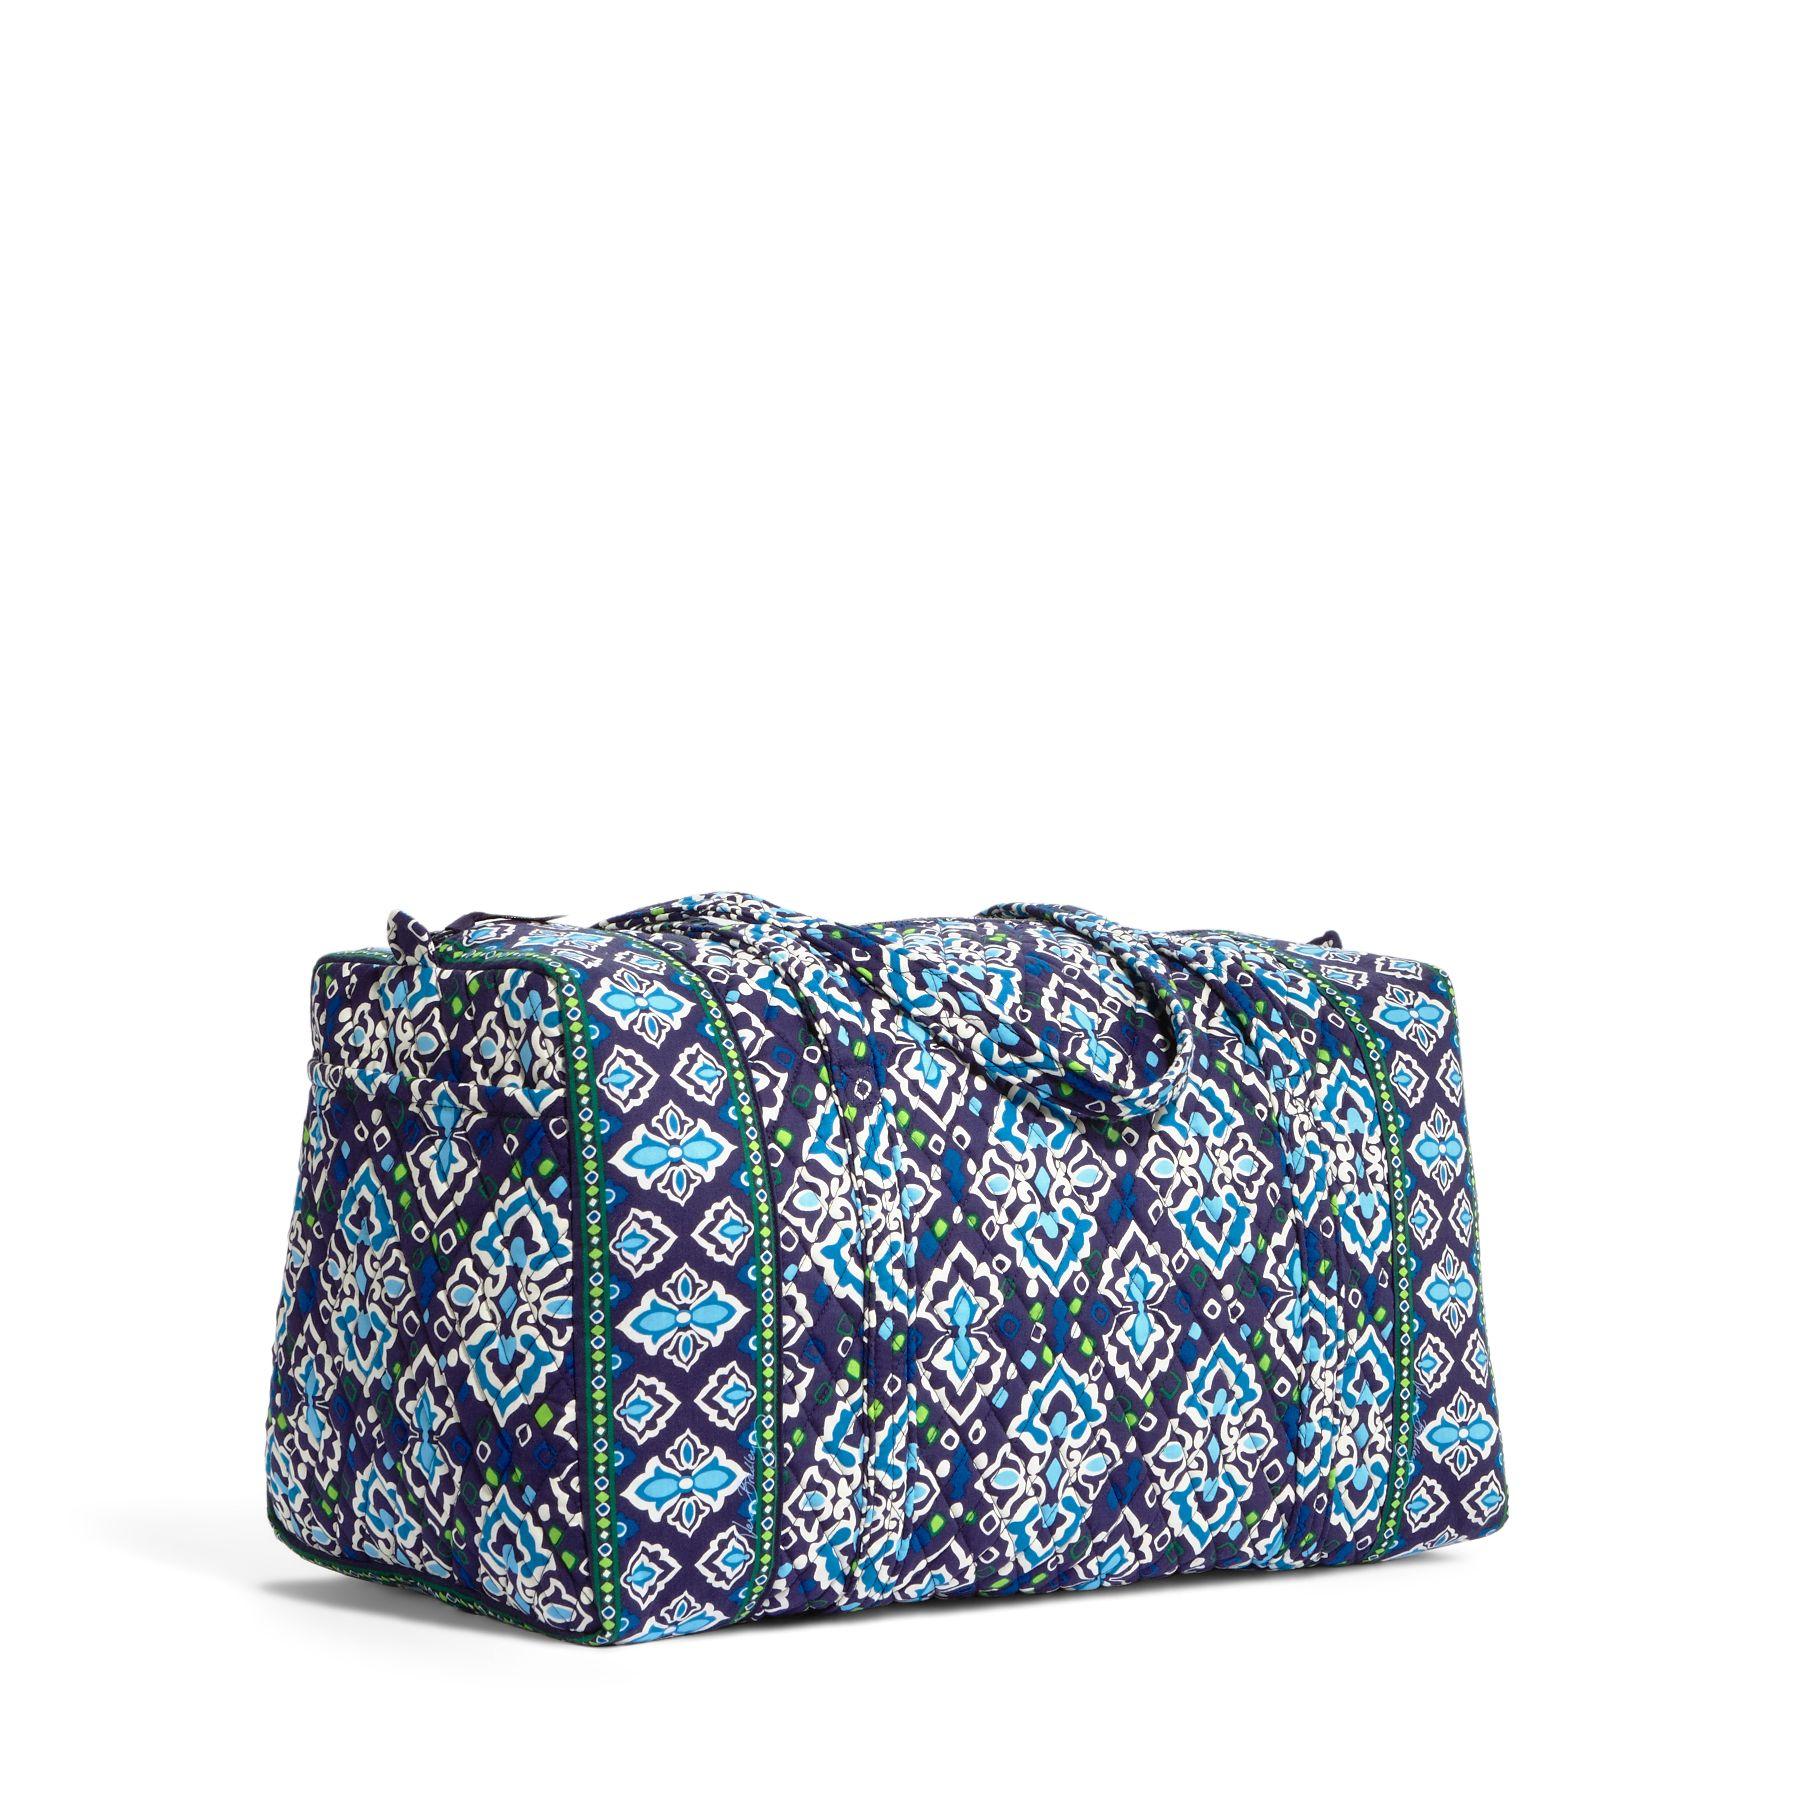 Gym Bag Vera Bradley: Vera Bradley Large Duffel Travel Bag